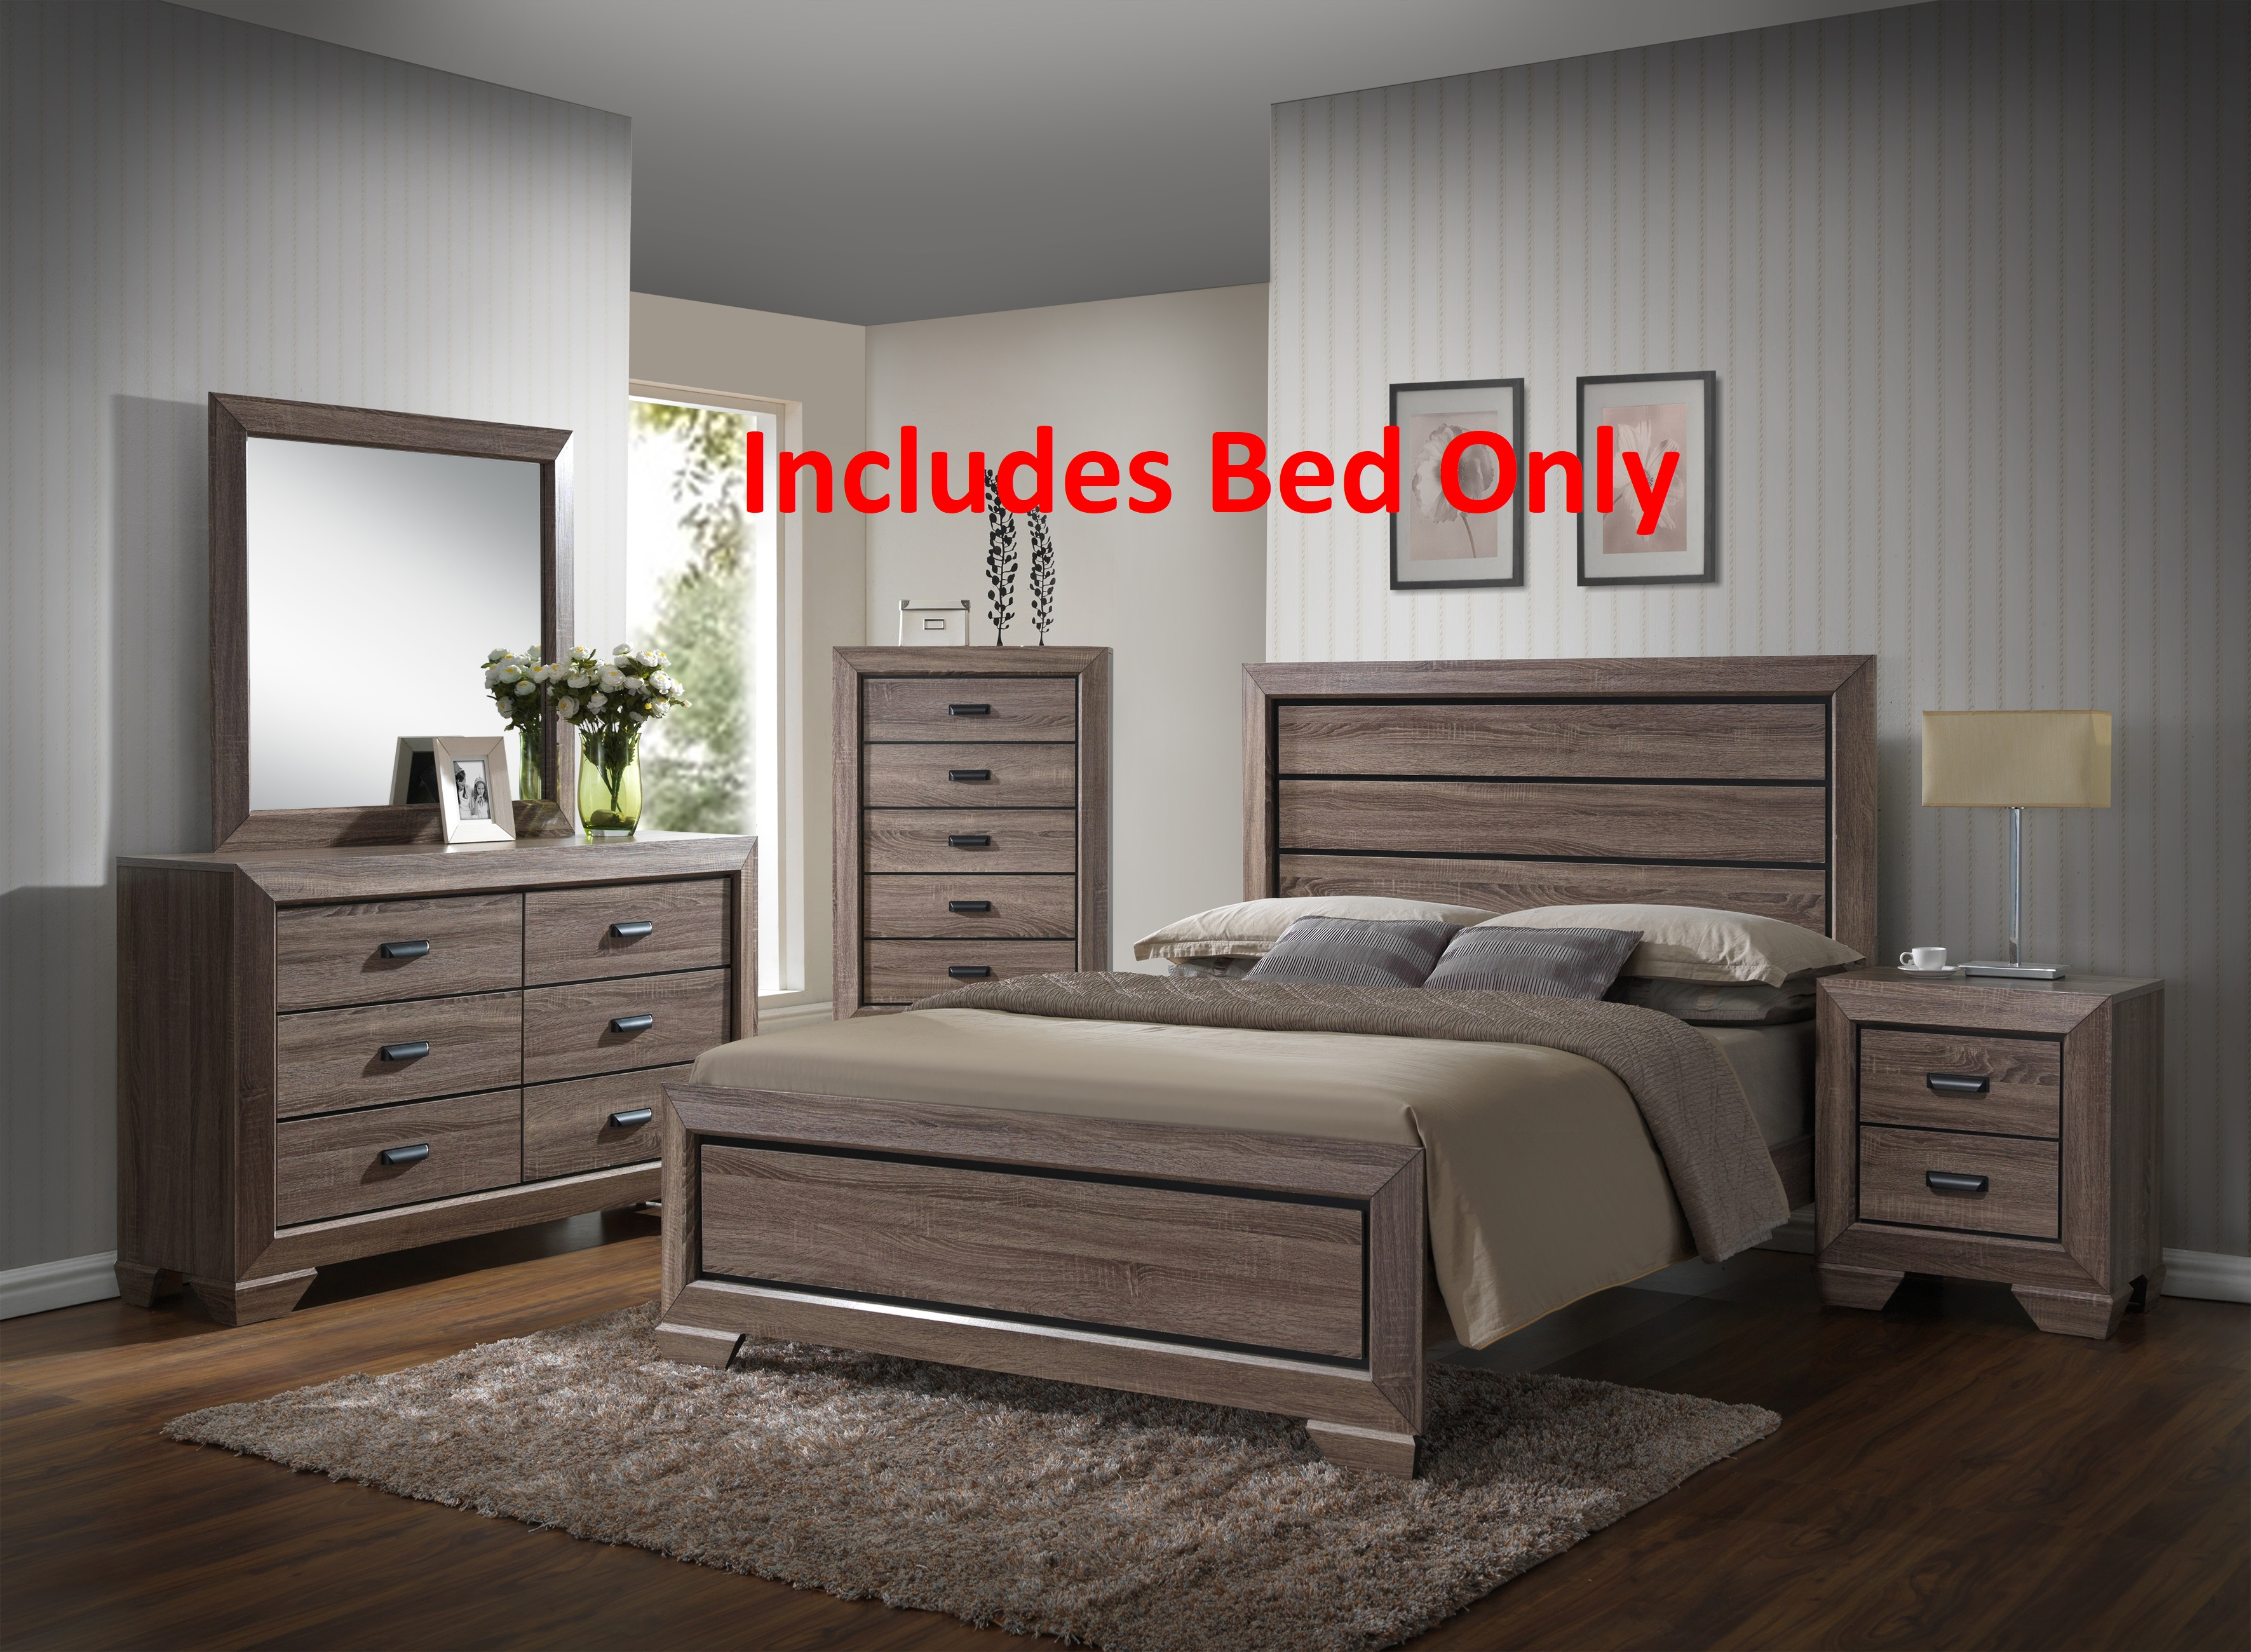 Jardena Queen Size Brown Wood Modern Bed (Headboard, Footboard, Rails) by Pilaster Designs